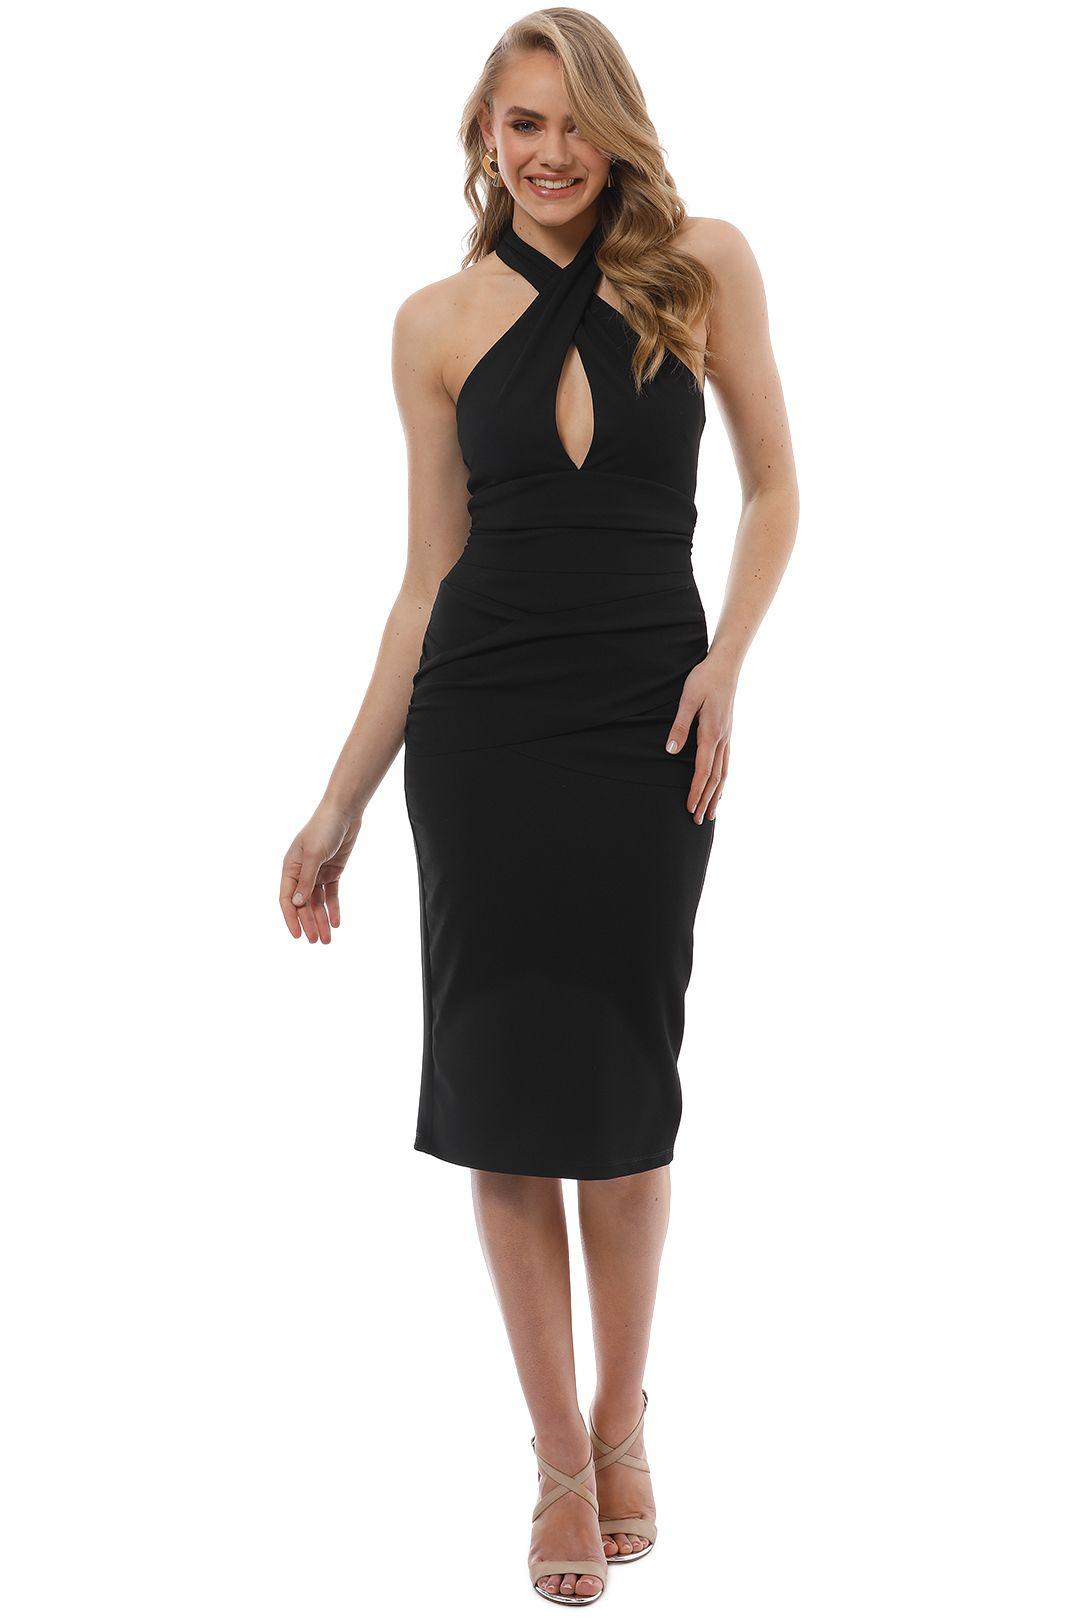 Pasduchas - Girl Crush Midi Dress -  Black - Front